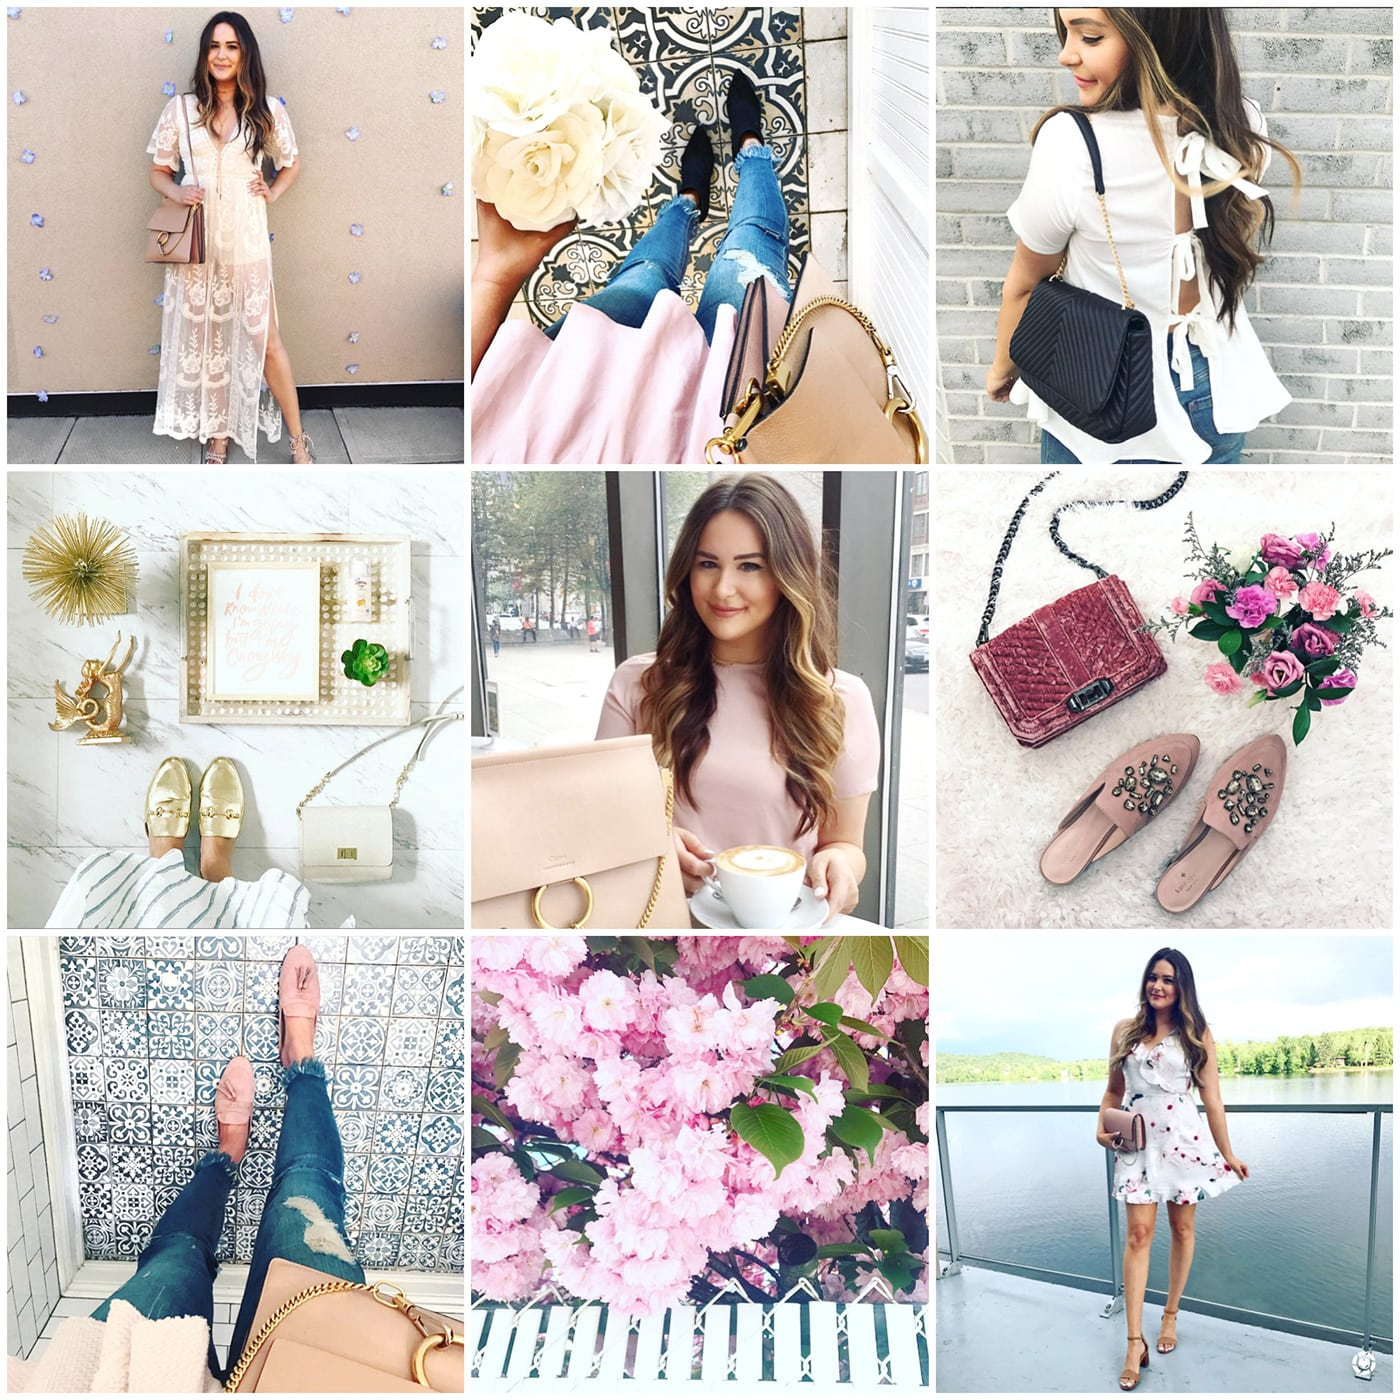 How To Style + Edit Instagram Photos by popular Orlando fashion blogger, Mash Elle   instagram inspo   Mash Elle beauty blogger